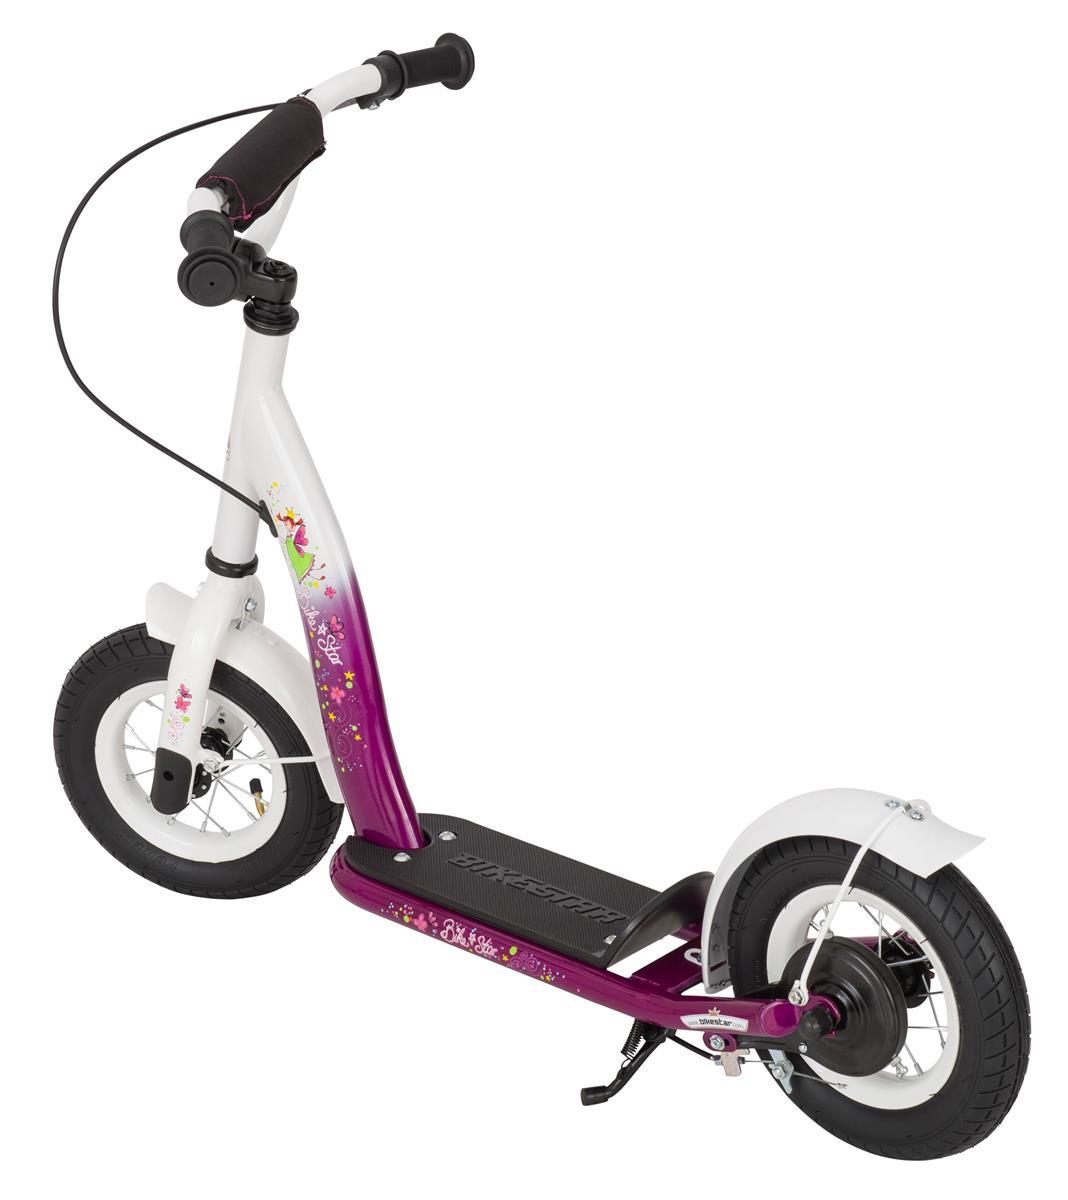 sc 10 kk 01 bywe bikestar 10 zoll roller klassik berry. Black Bedroom Furniture Sets. Home Design Ideas